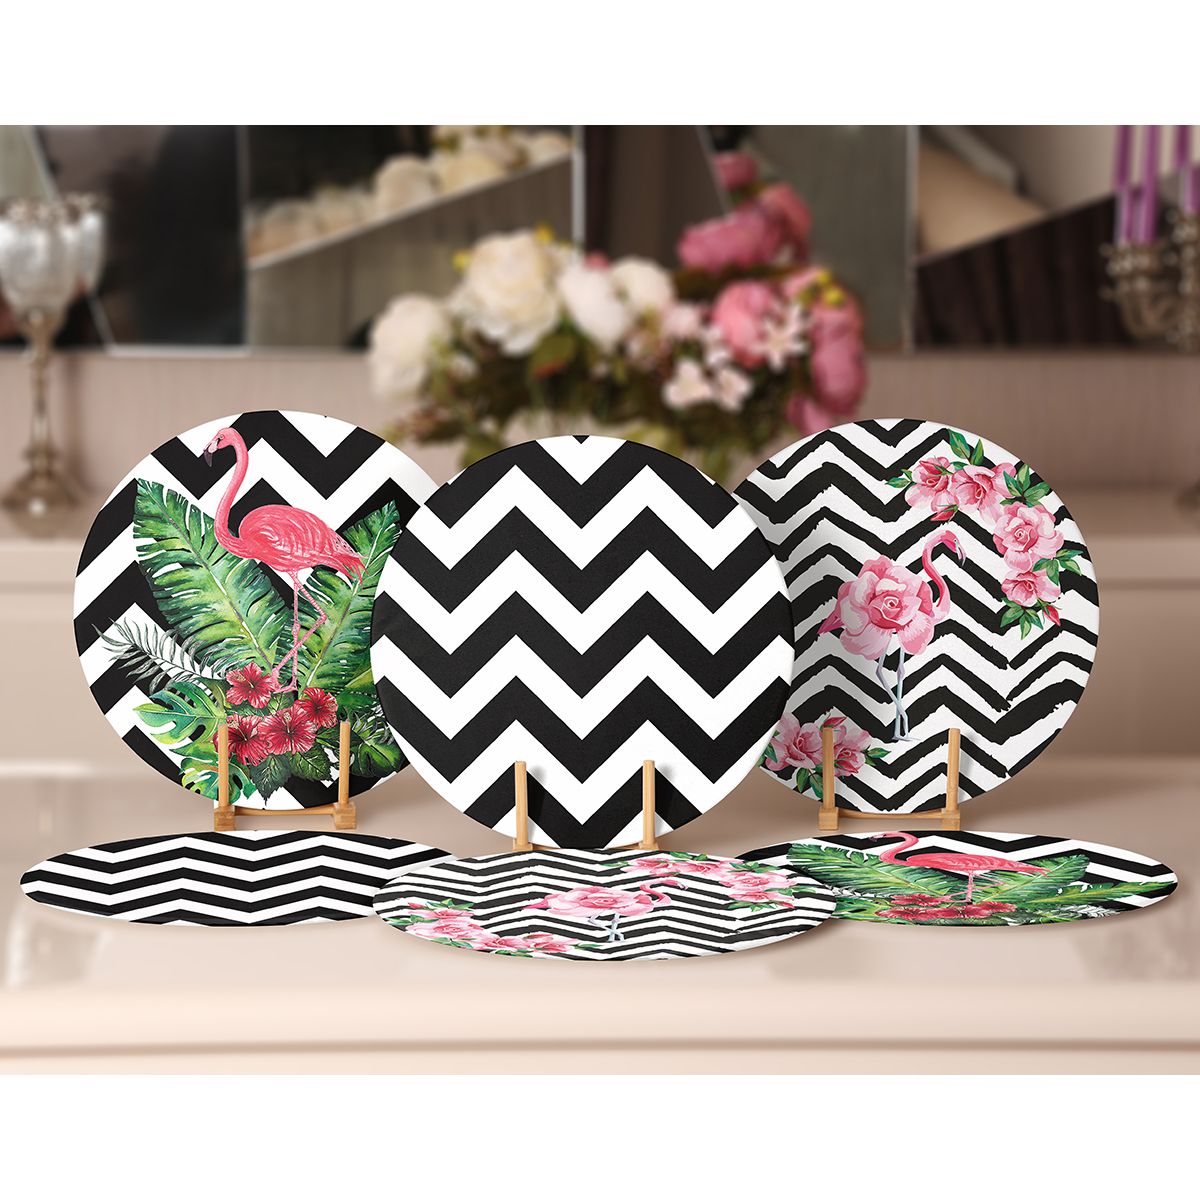 6'lı Siyah Beyaz Zigzag Zeminli Flamingo Tasarımlı Servis Altlığı & Supla Realhomes